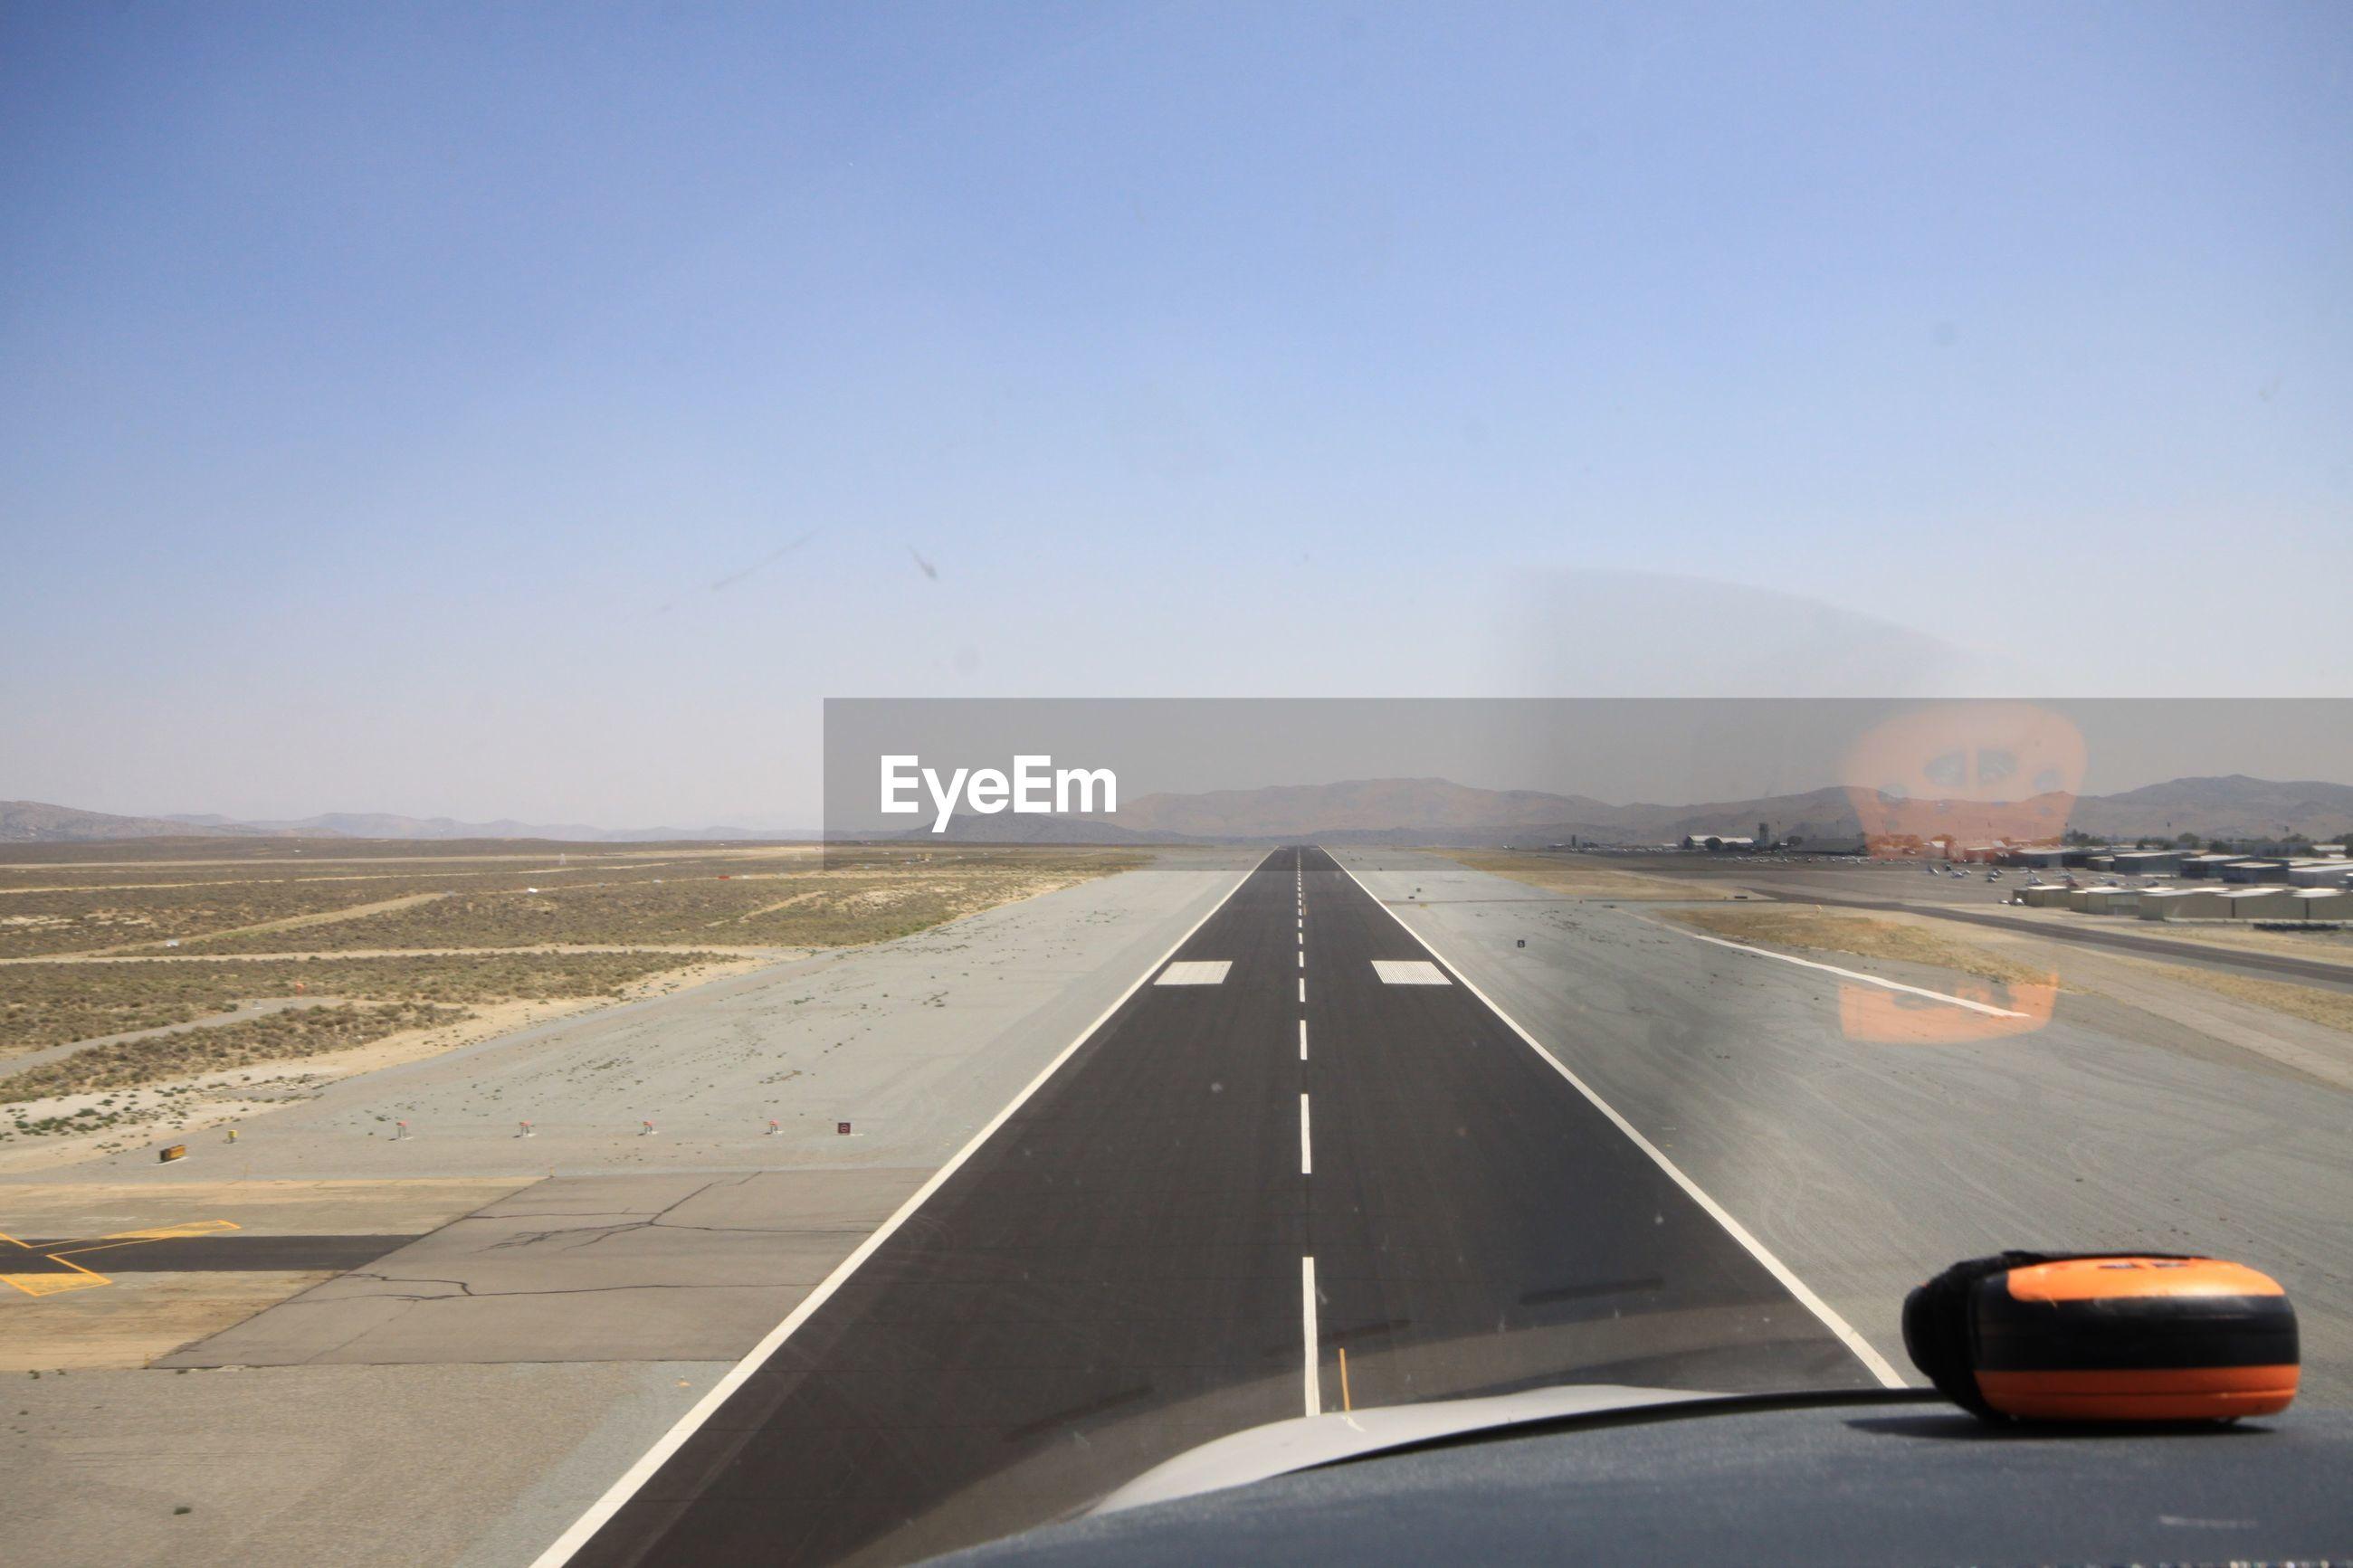 Runway seen through airplane windshield against clear blue sky